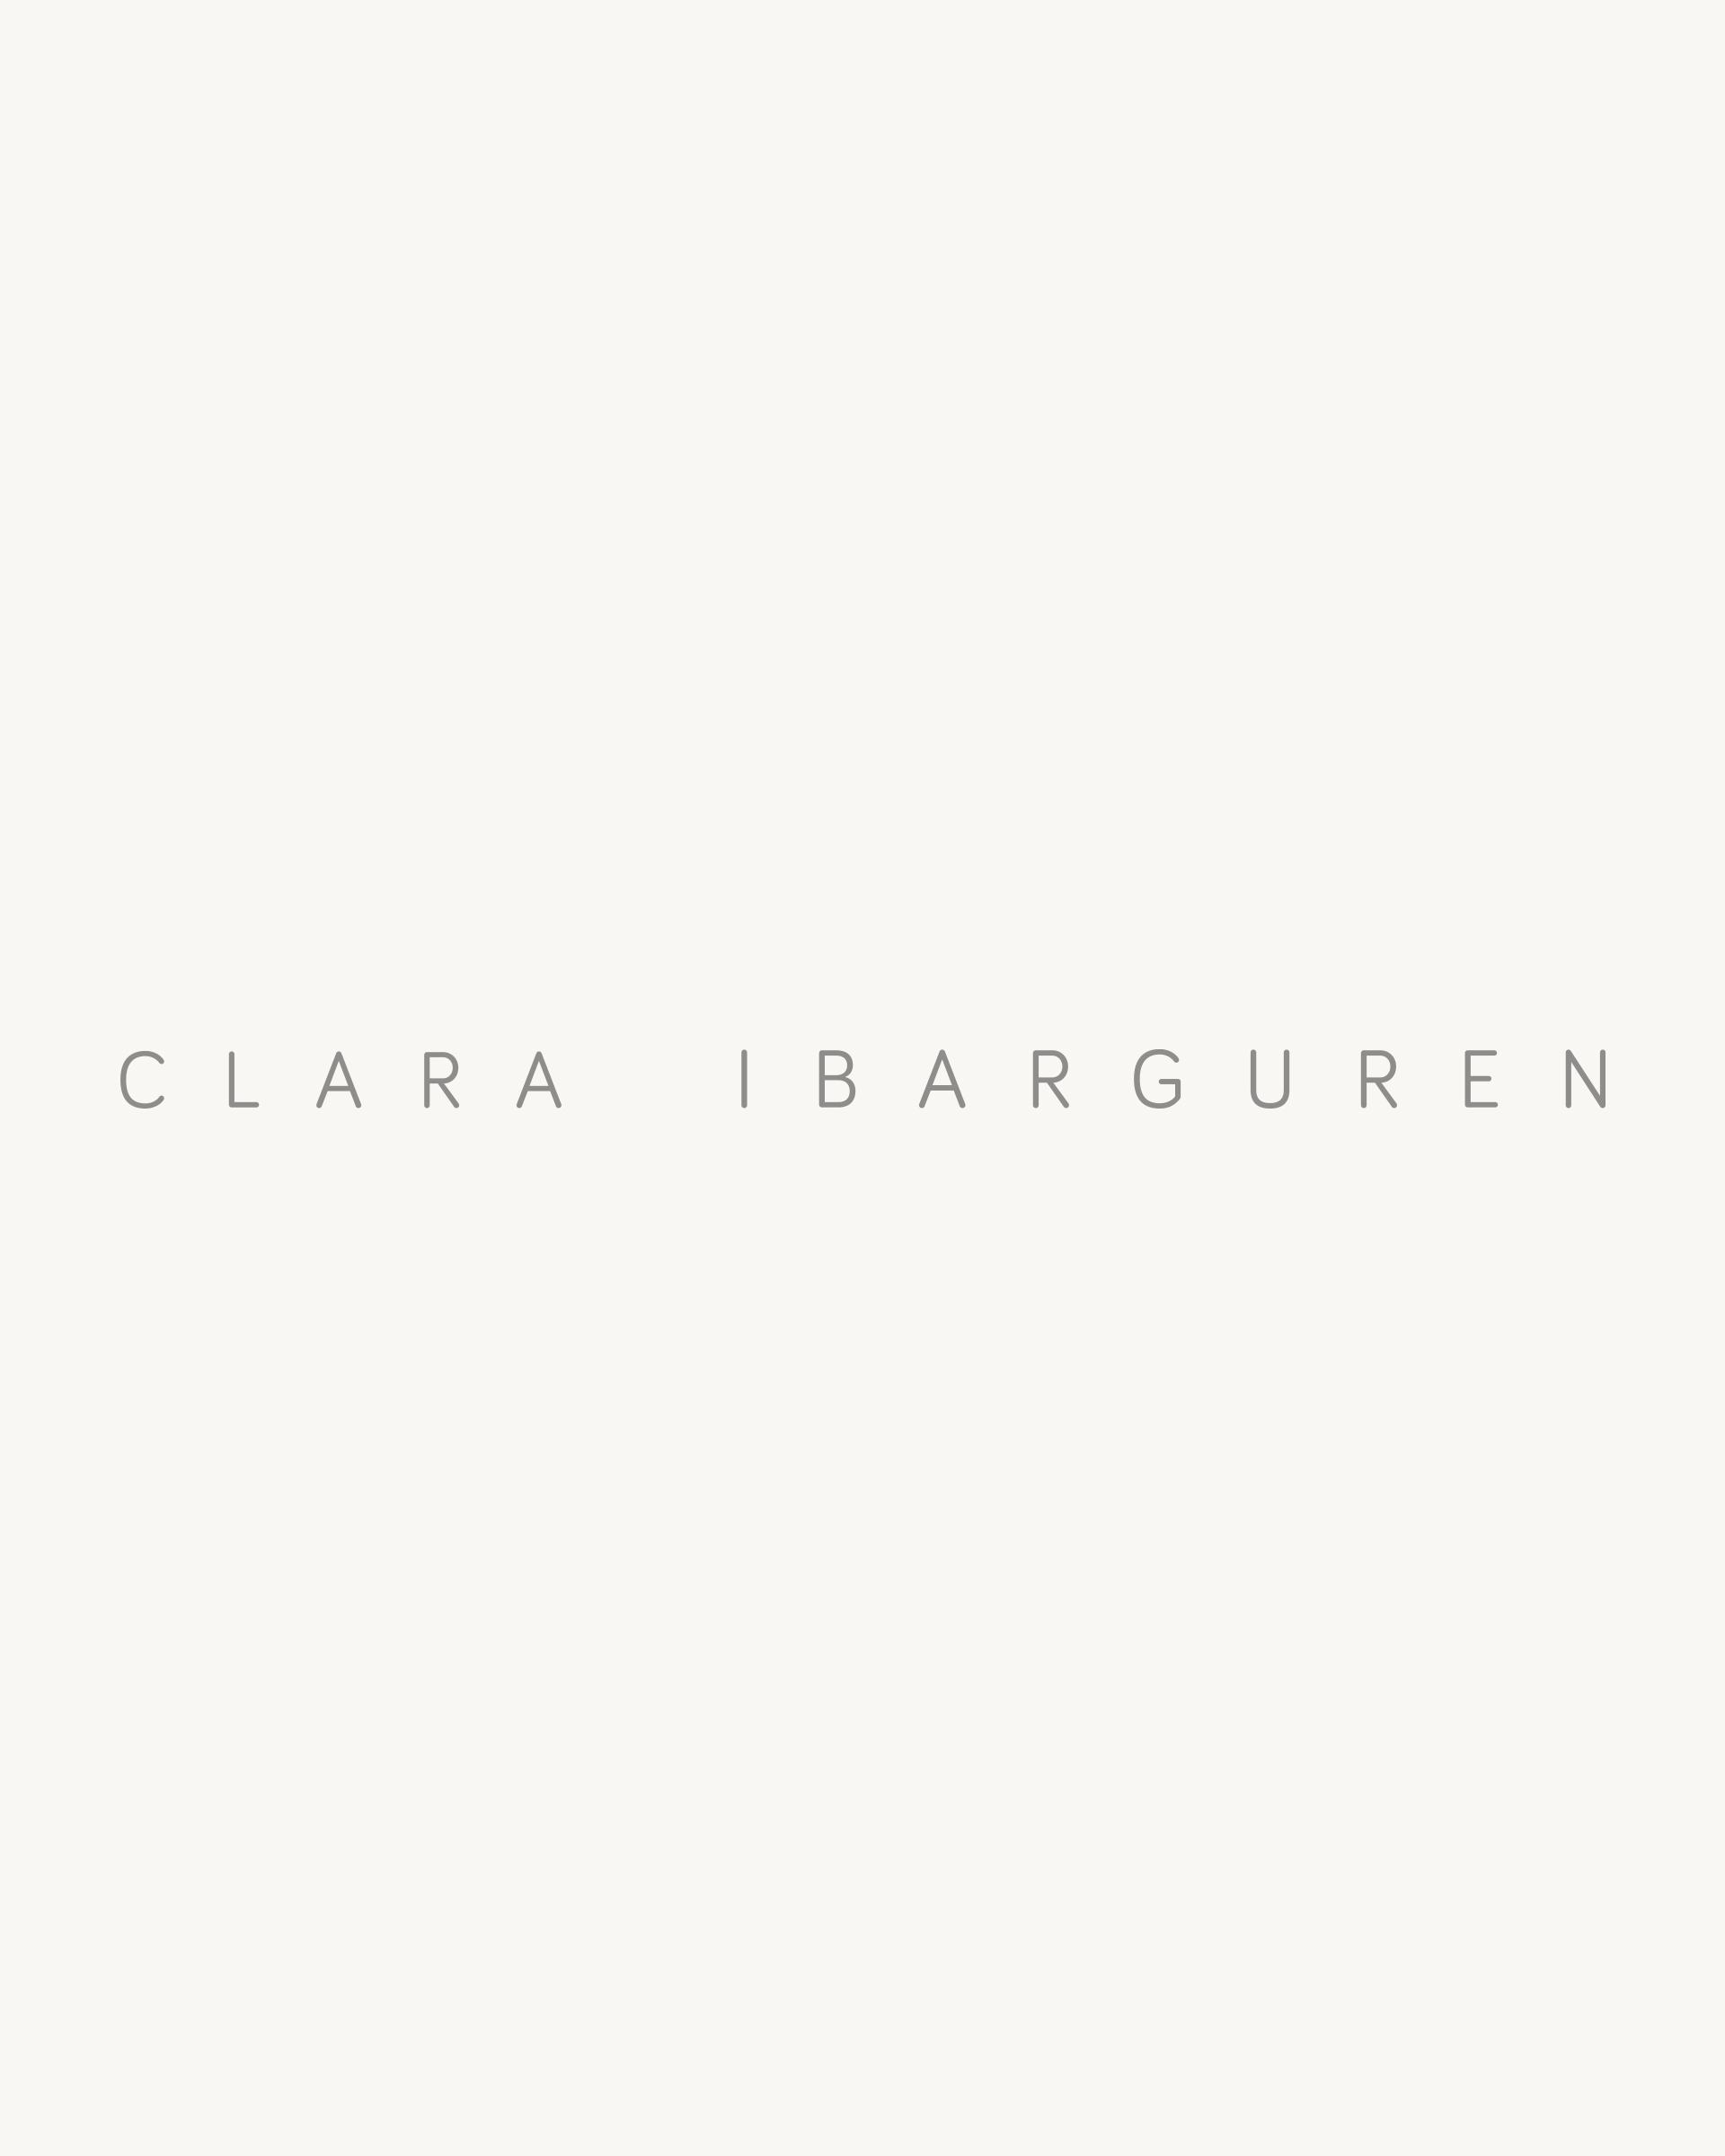 Banner Envio Gratis